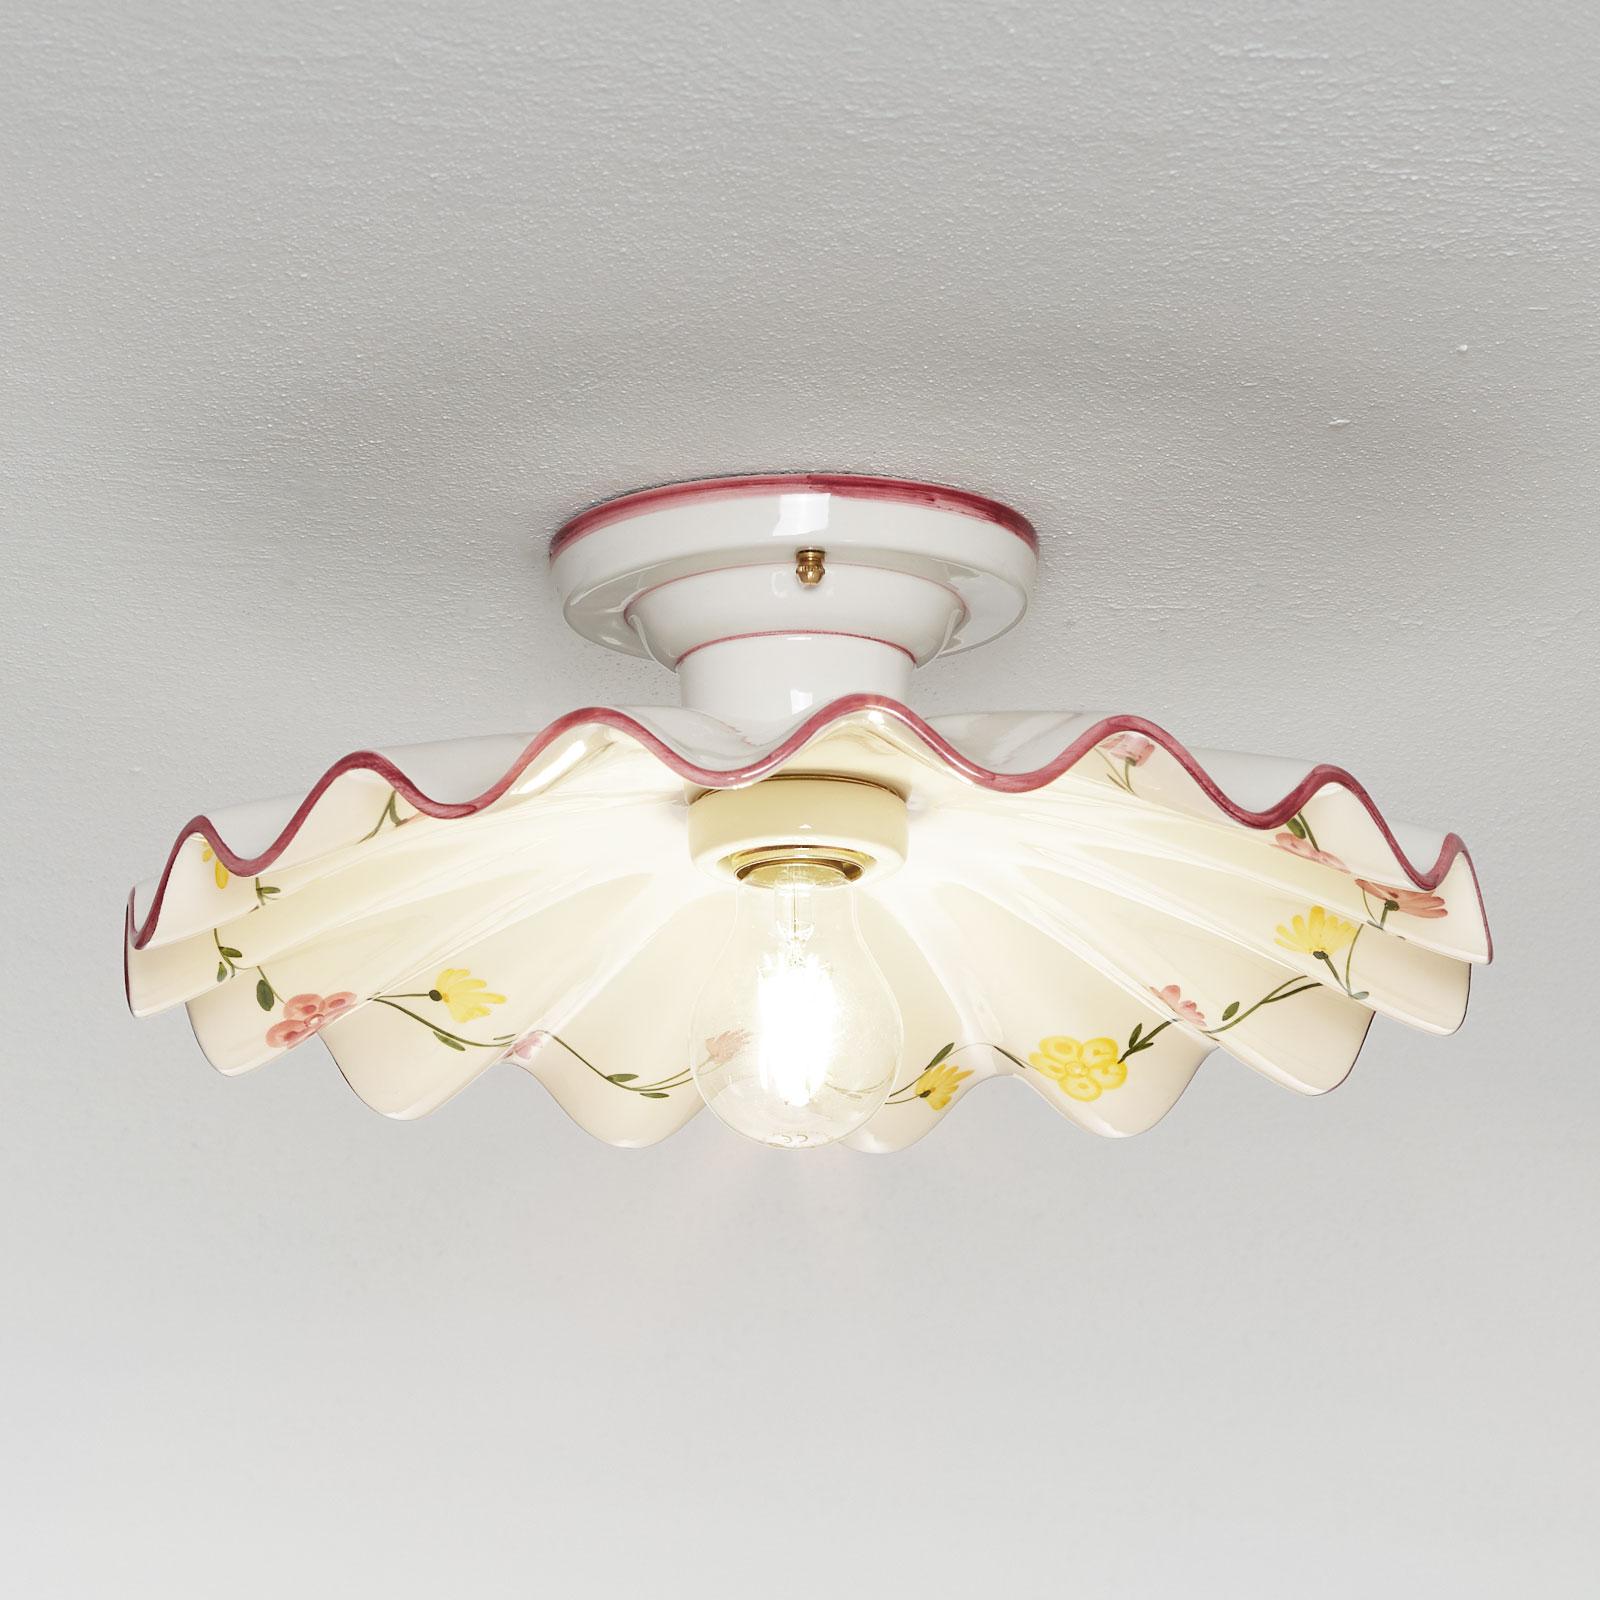 Plafondlamp Ametista van keramiek met tussenruimte